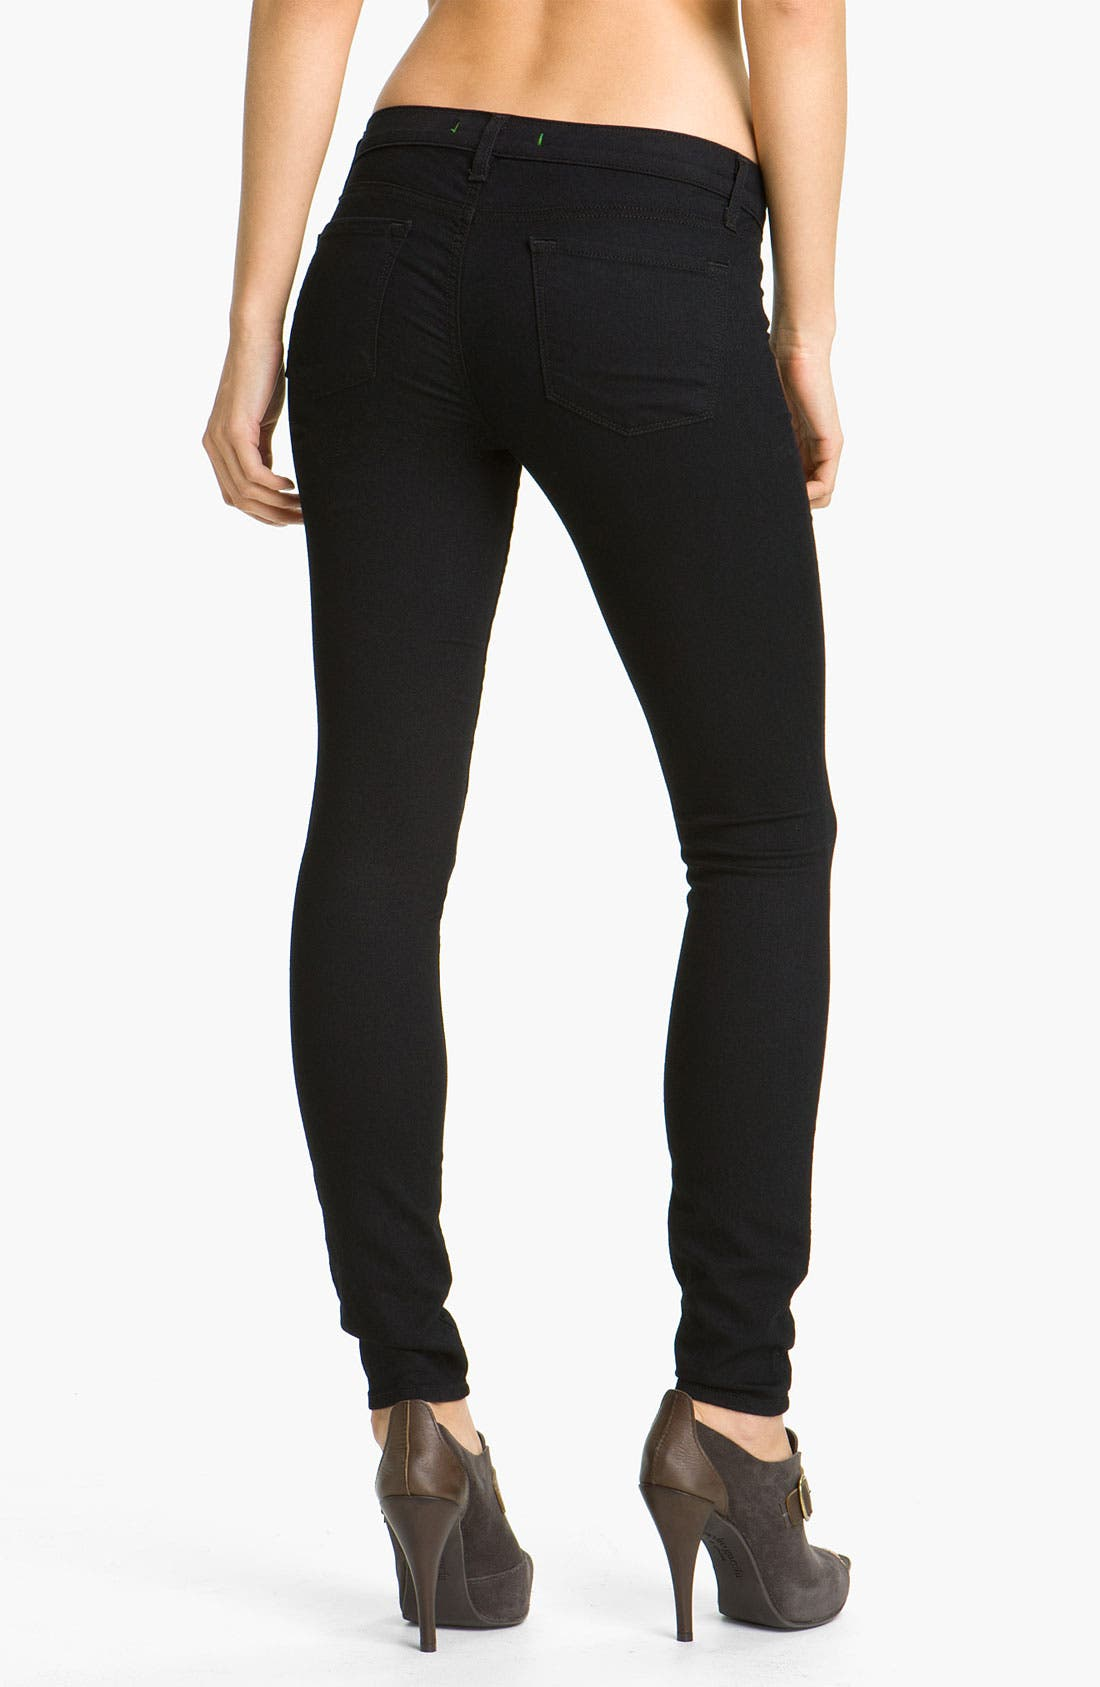 J BRAND,                             'Legging' Stretch Jeans,                             Alternate thumbnail 3, color,                             002